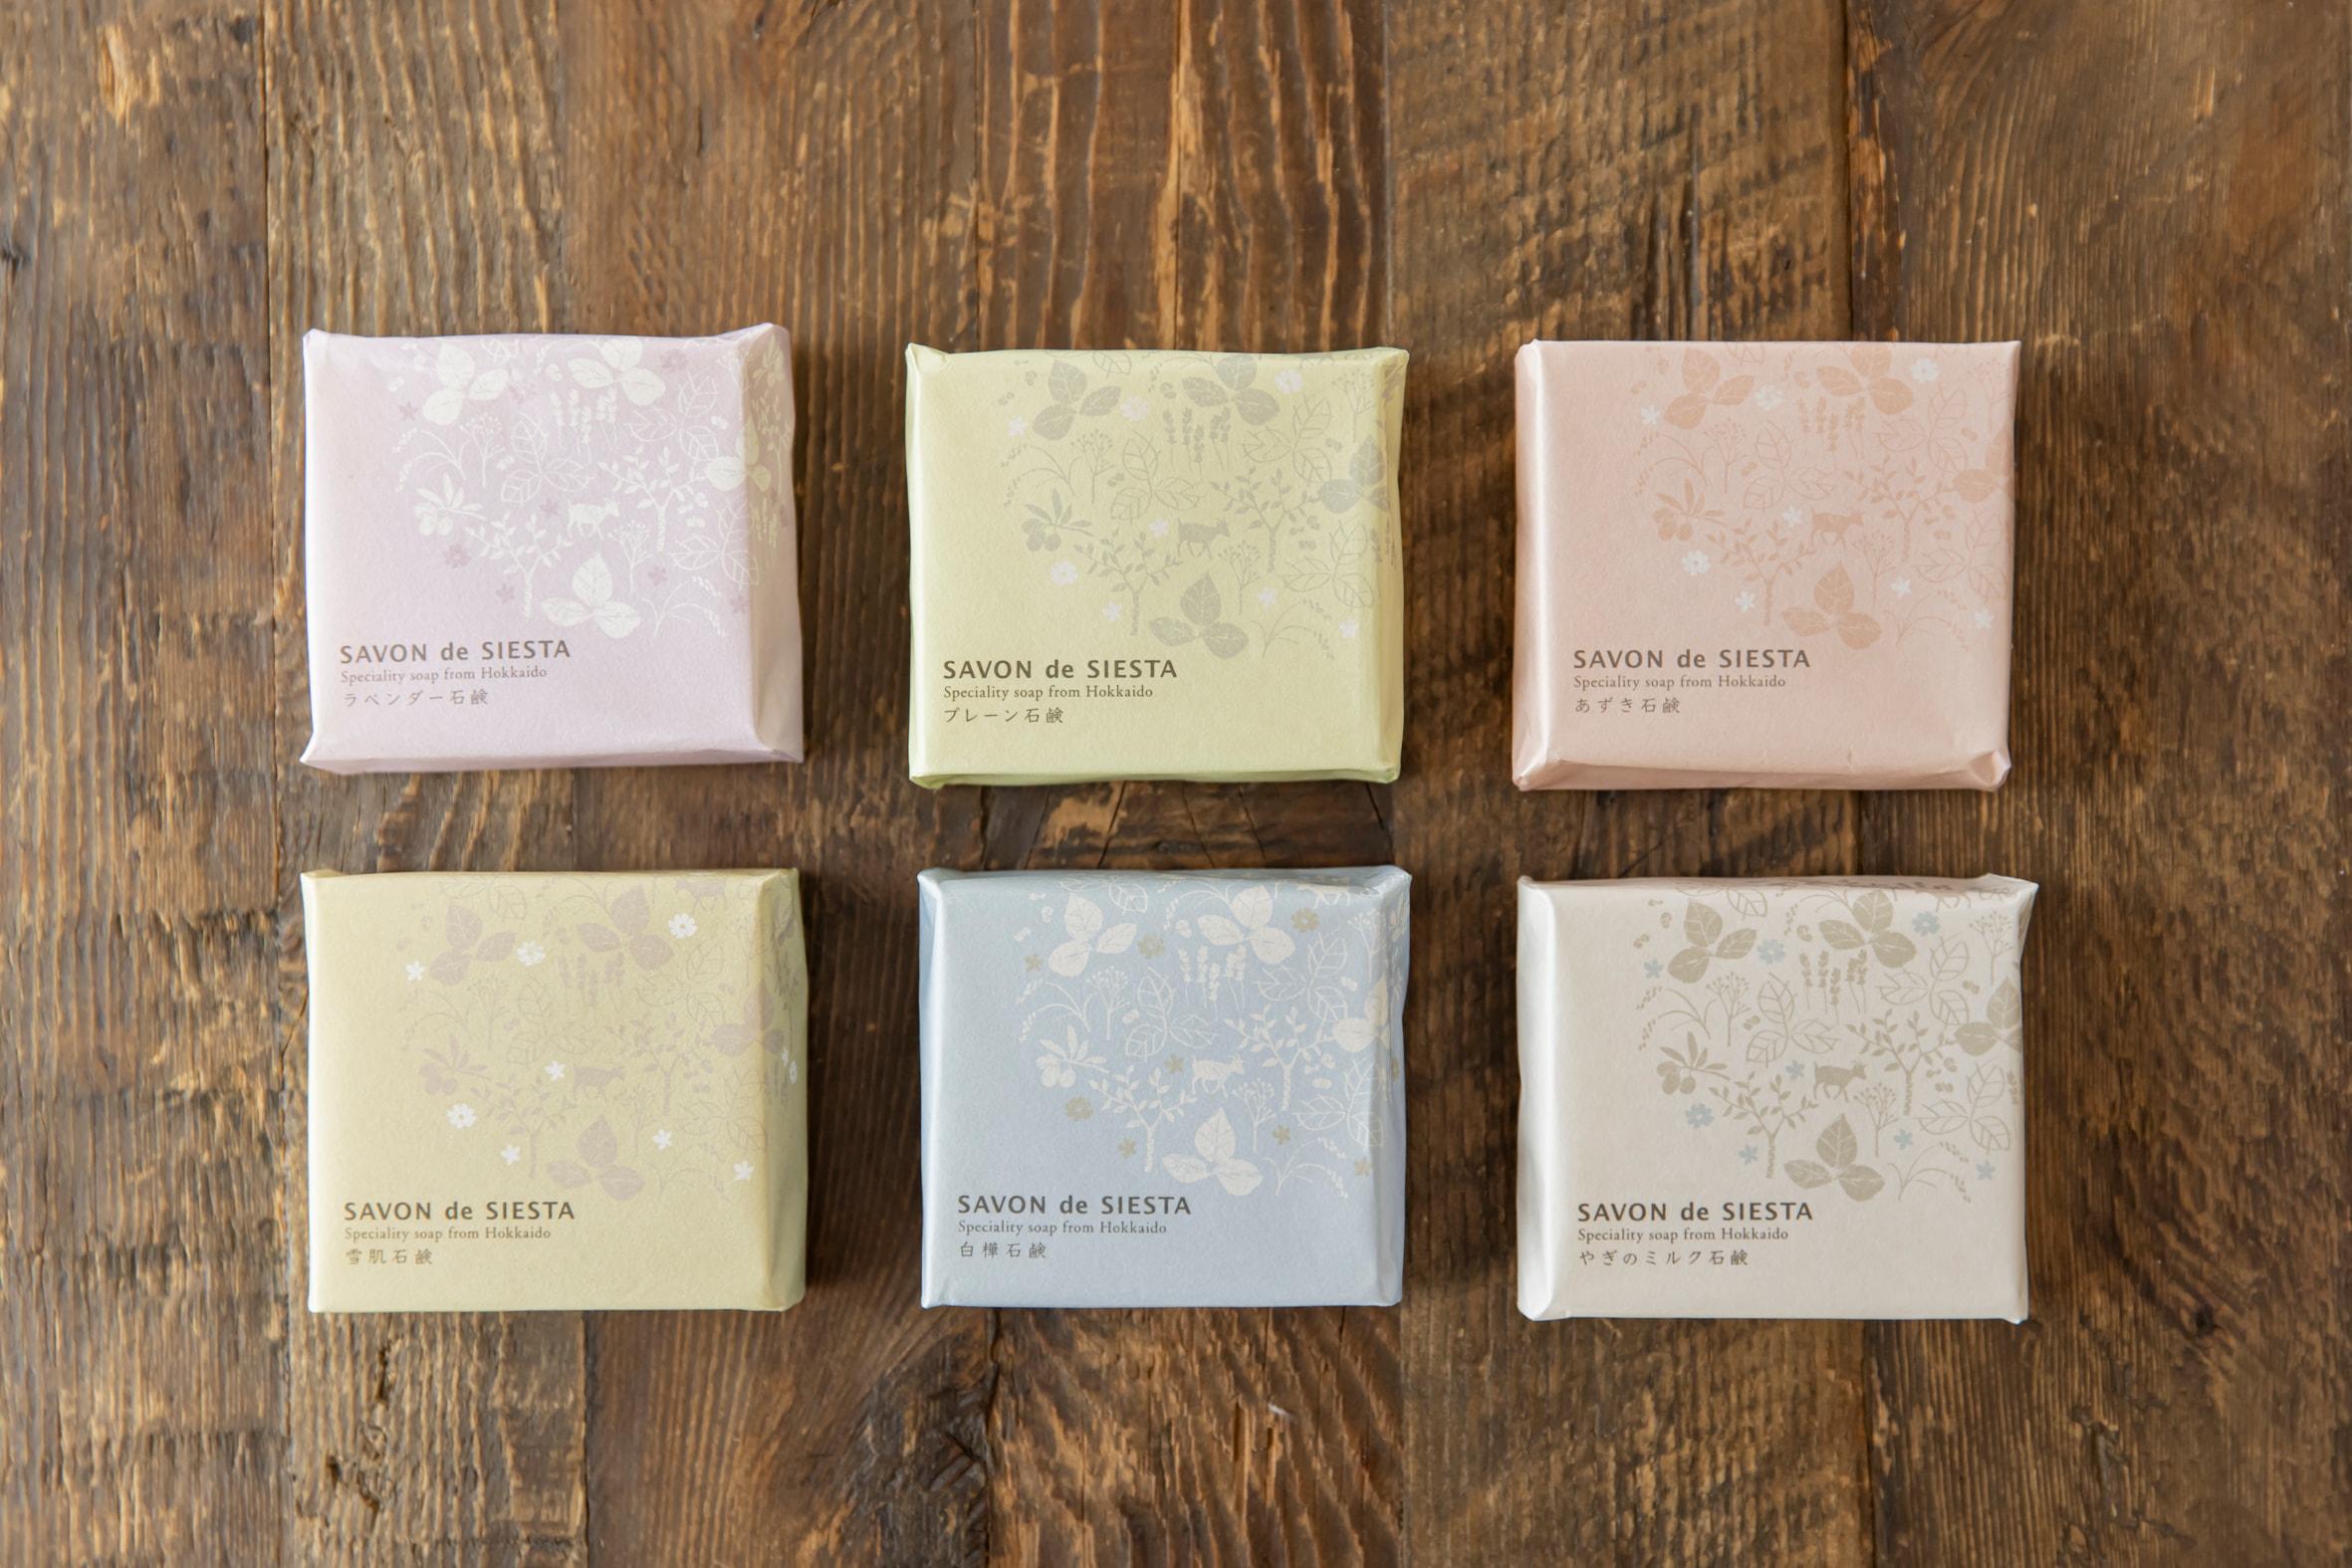 SAVON de SIESTA(サボンデシエスタ)のHand made Solid Soap《プレーン石鹸/ラベンダー石鹸/あずき石鹸/やぎのミルク石鹸/白樺石鹸/雪肌石鹸》,札幌スタイル認証製品